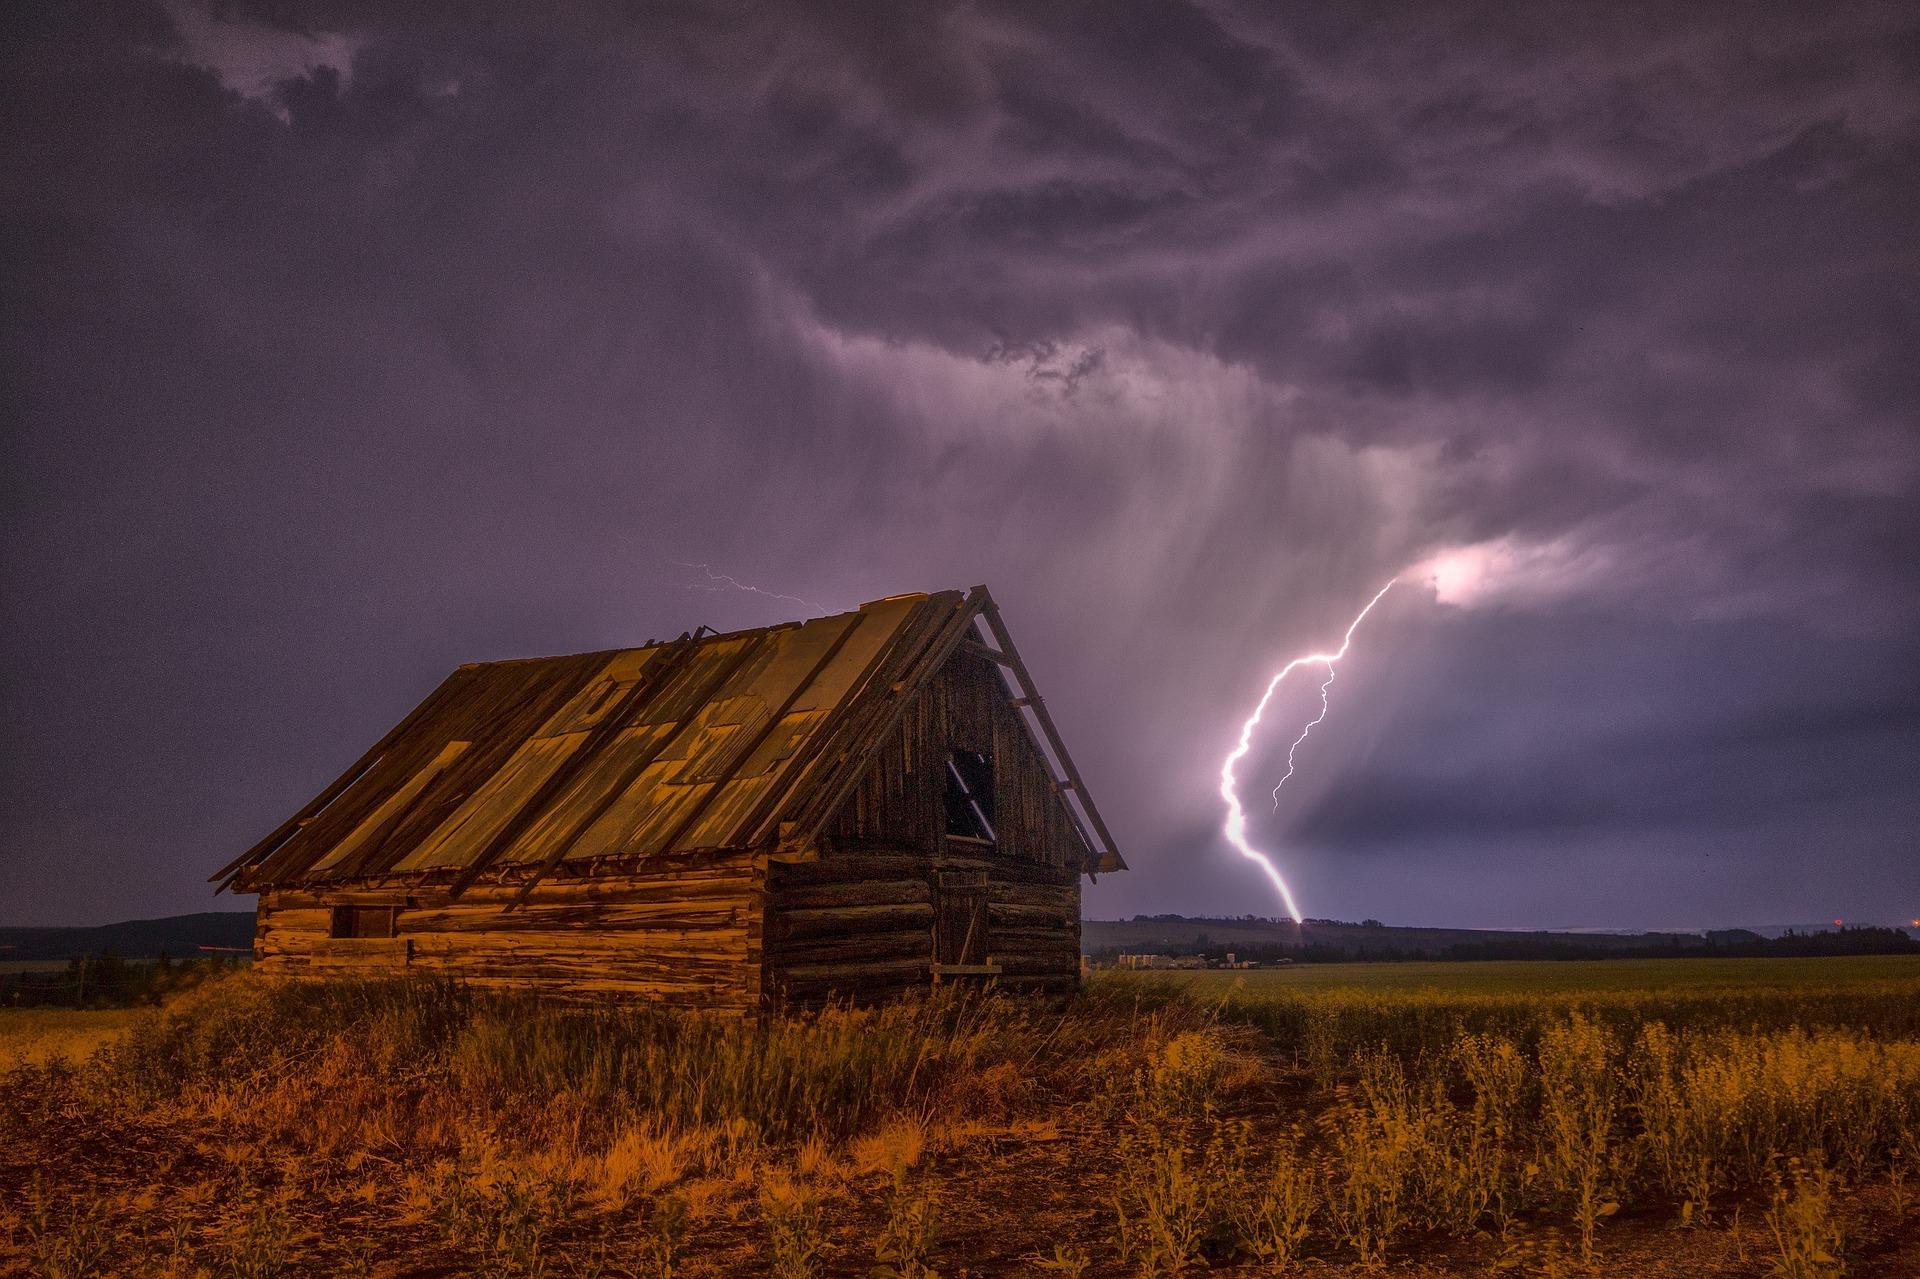 granero, rayo, tormenta, nubes, cielo, tempestad, violeta - Fondos de Pantalla HD - professor-falken.com